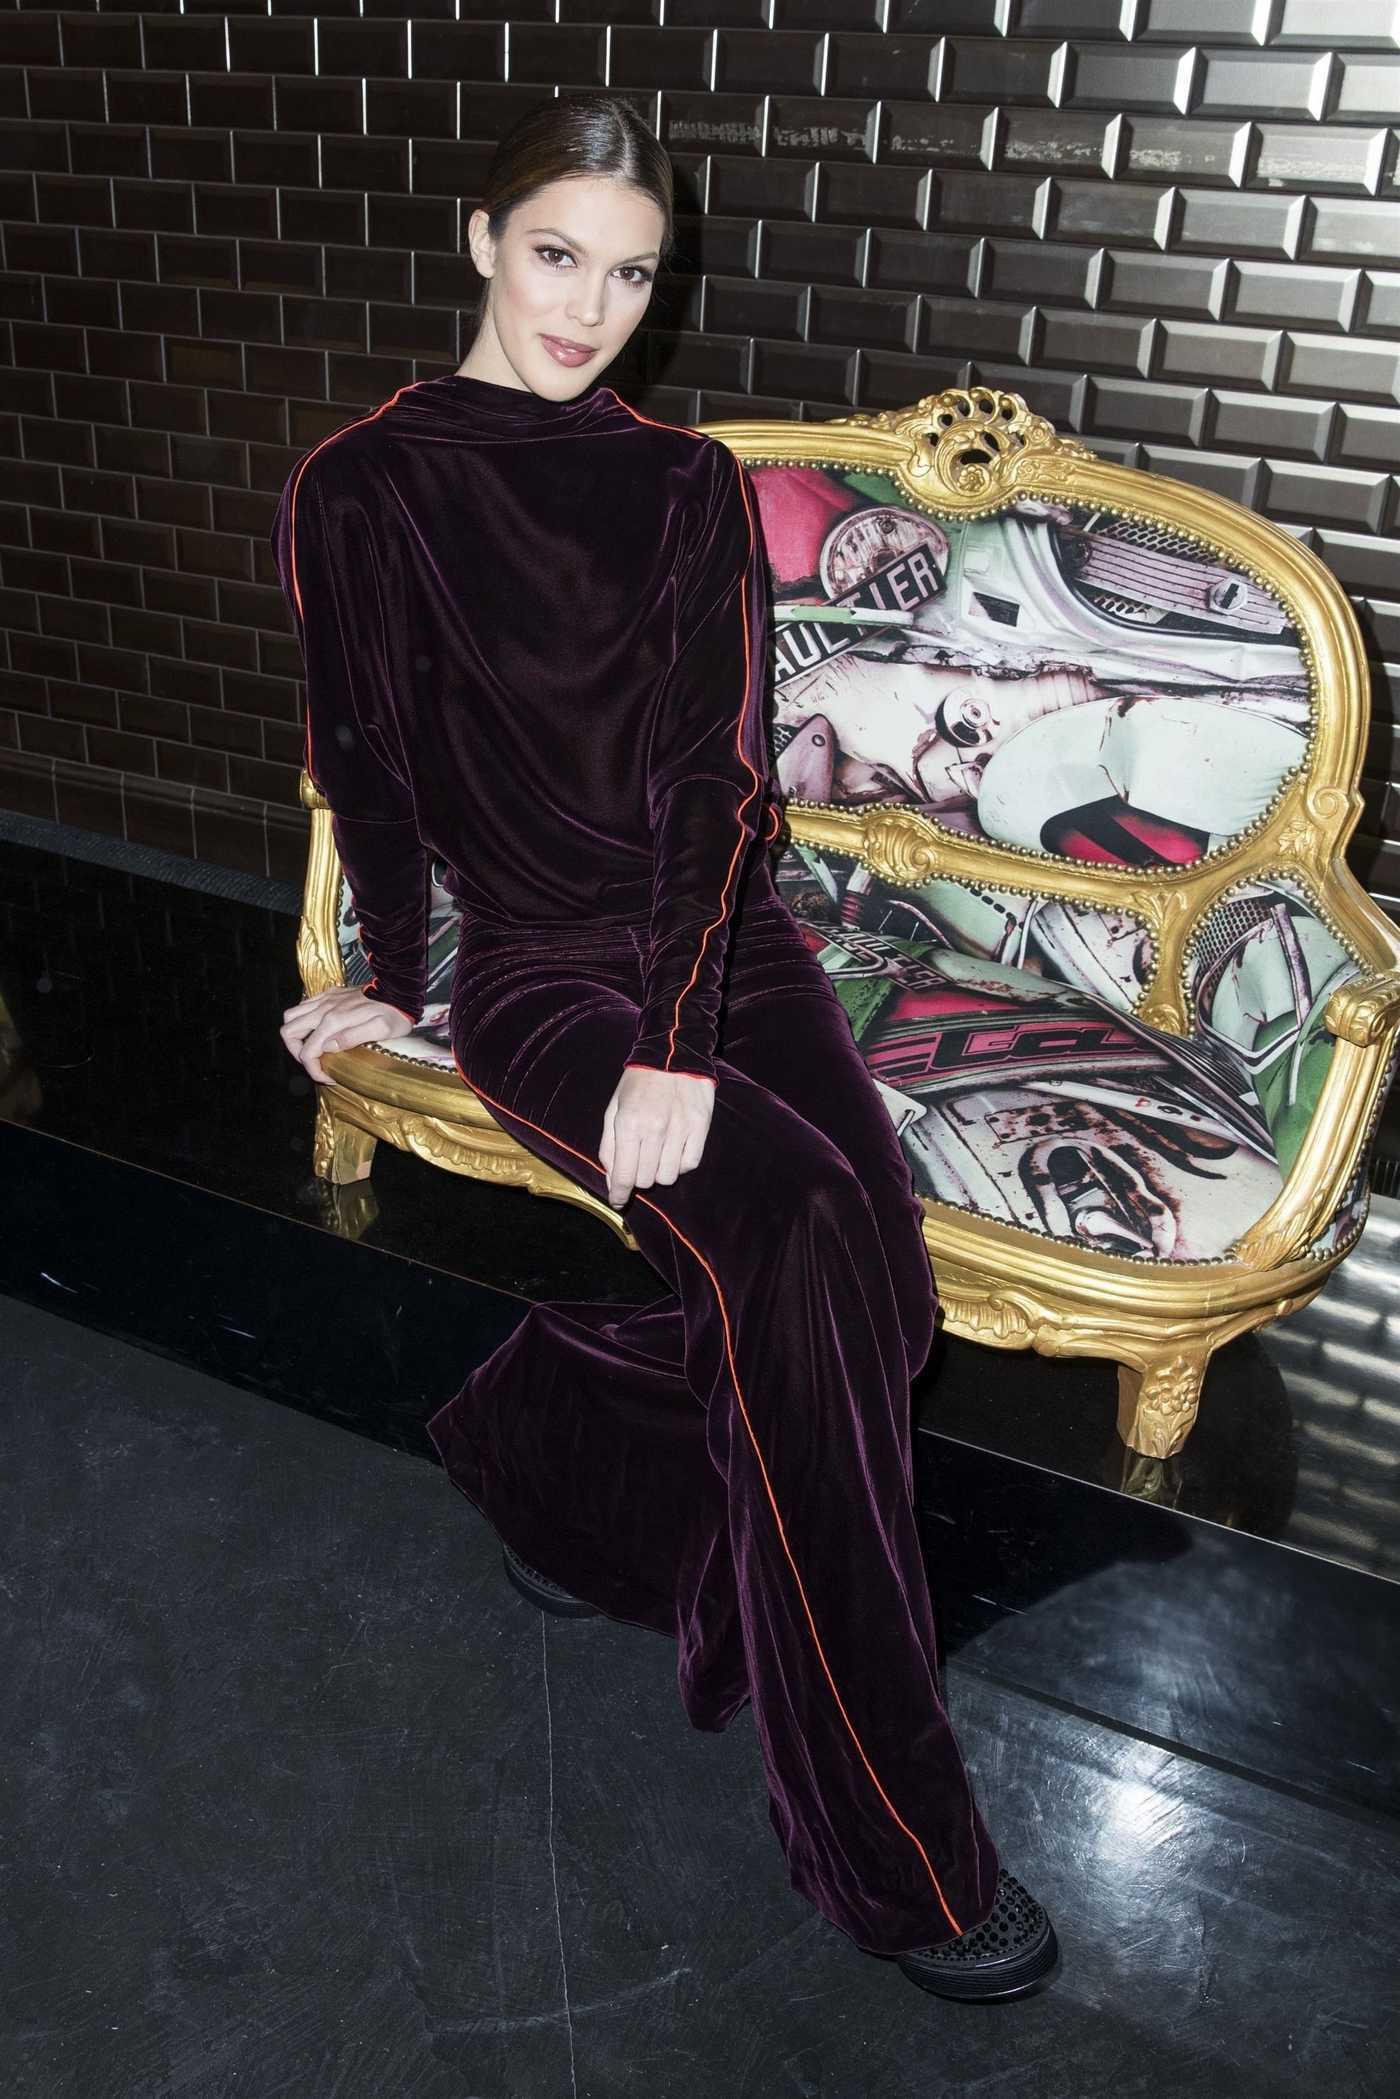 Iris Mittenaere at the Jean Paul Gaultier 2018 Show During the Paris Fashion Week in Paris 01/24/2018